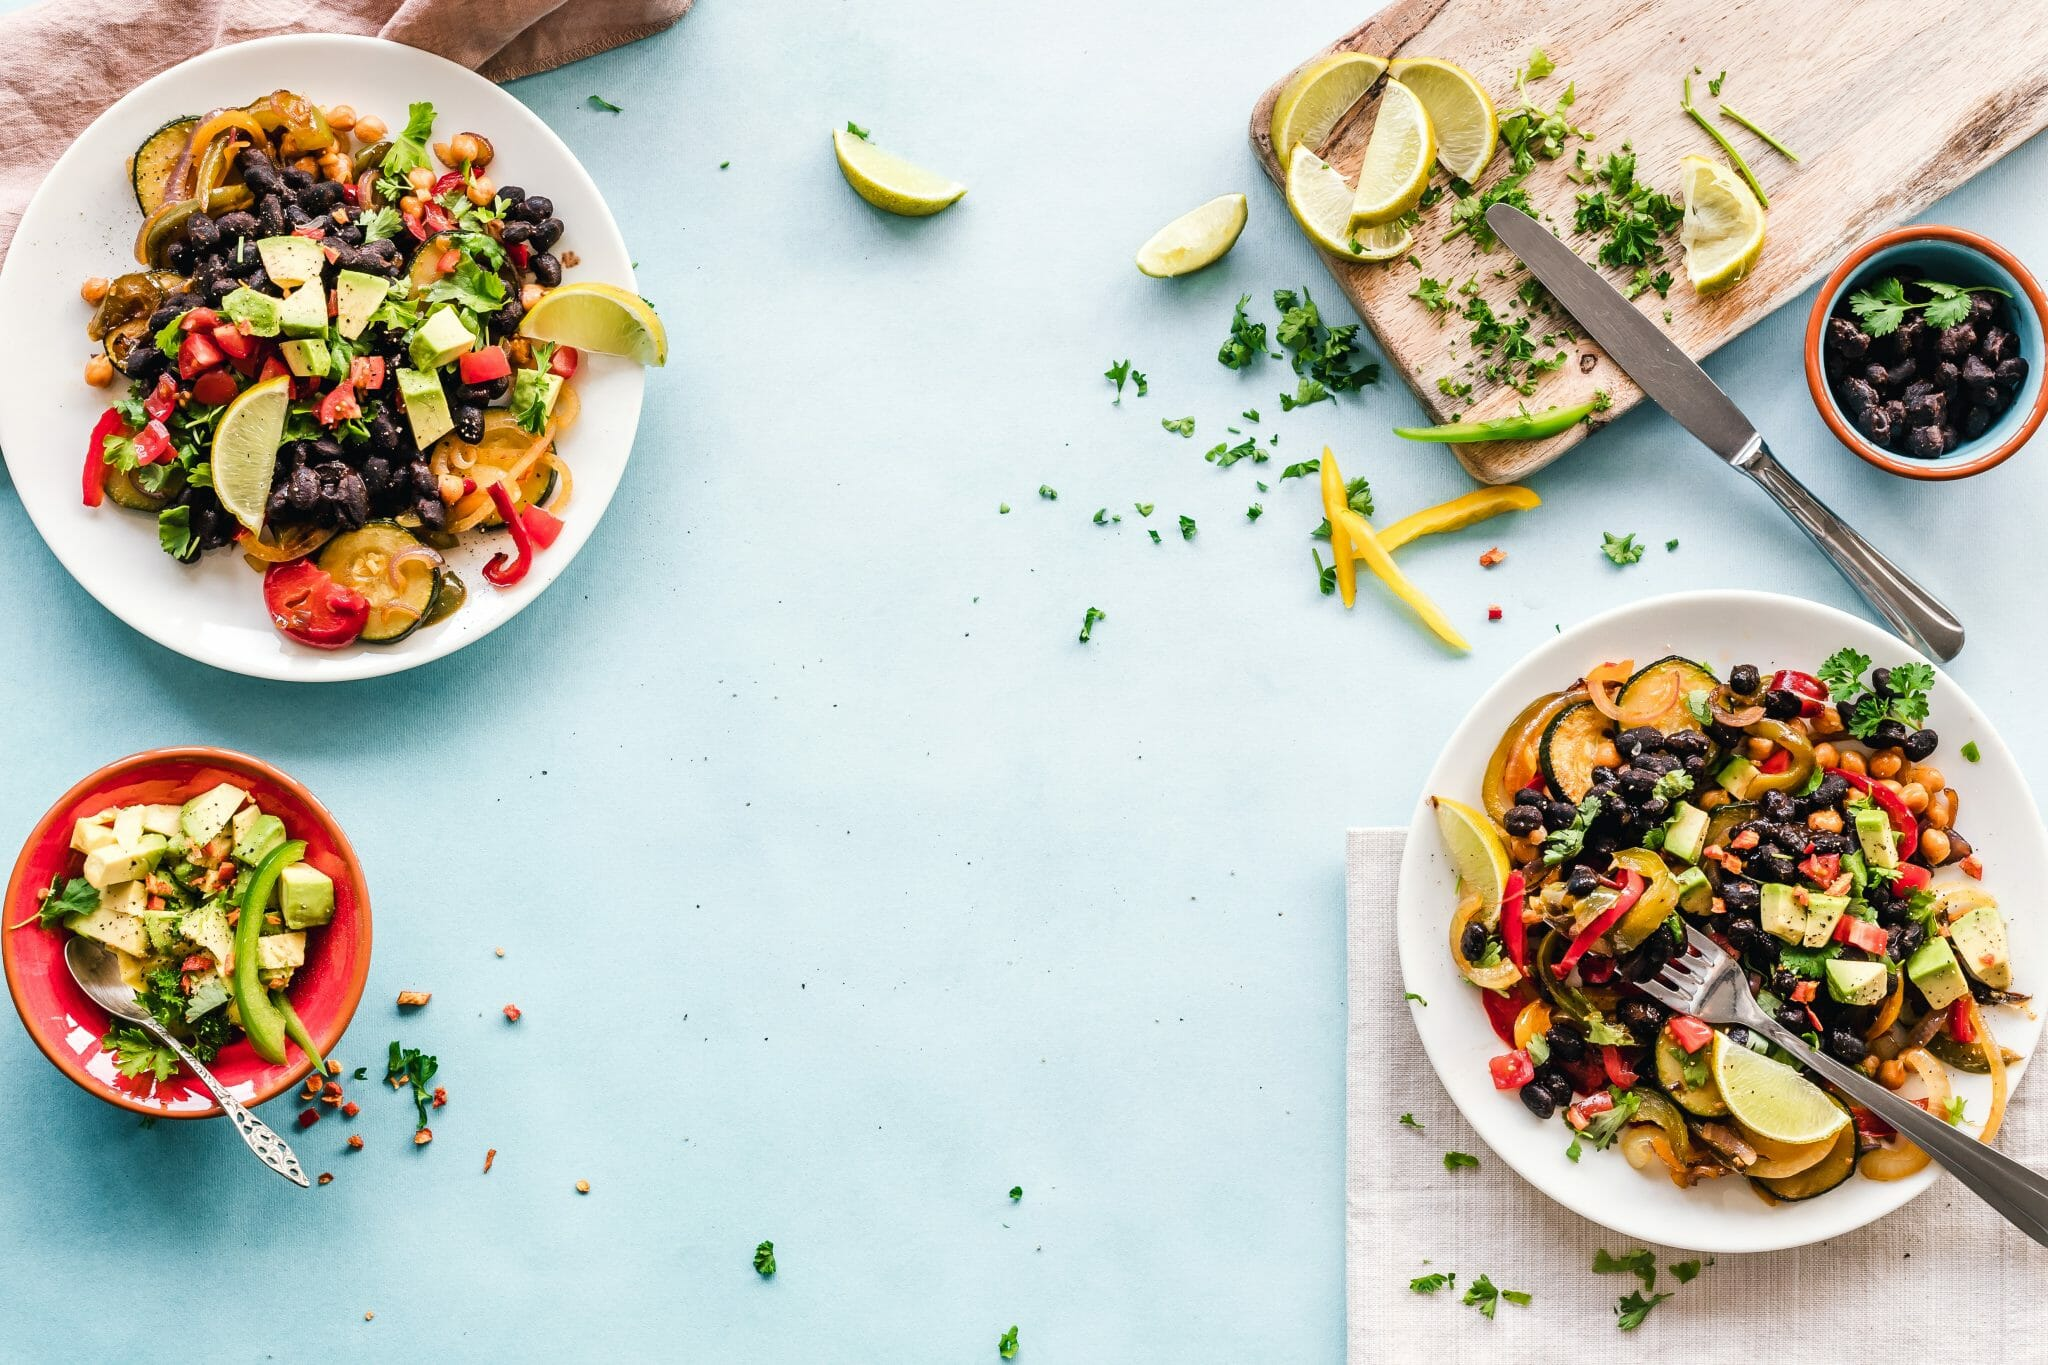 Influencer inspiration for your Flexitarian diet